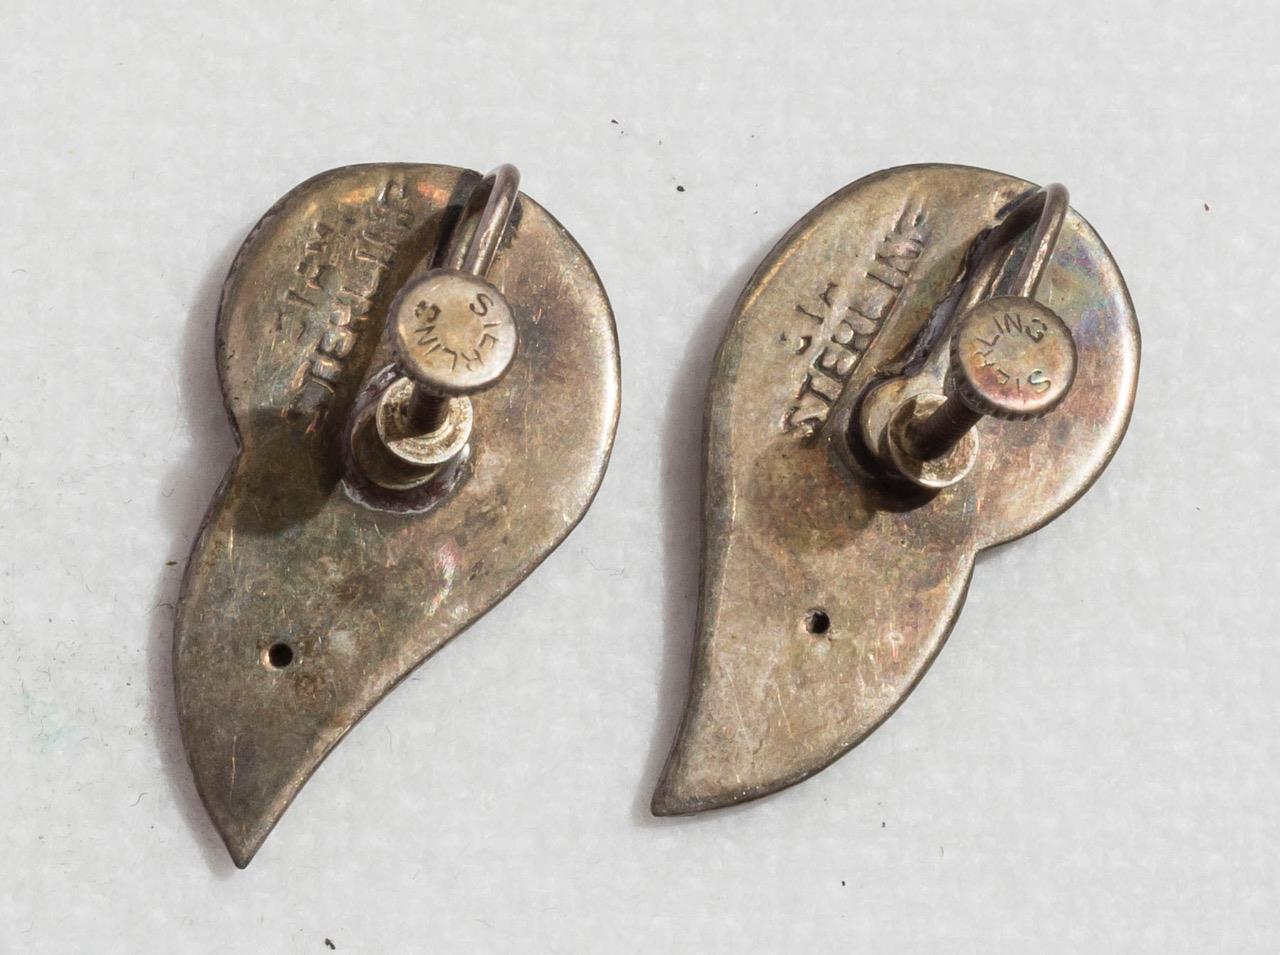 Vintage Sterling Silver Screw On Clip On Earrings Jewelry jds image 2